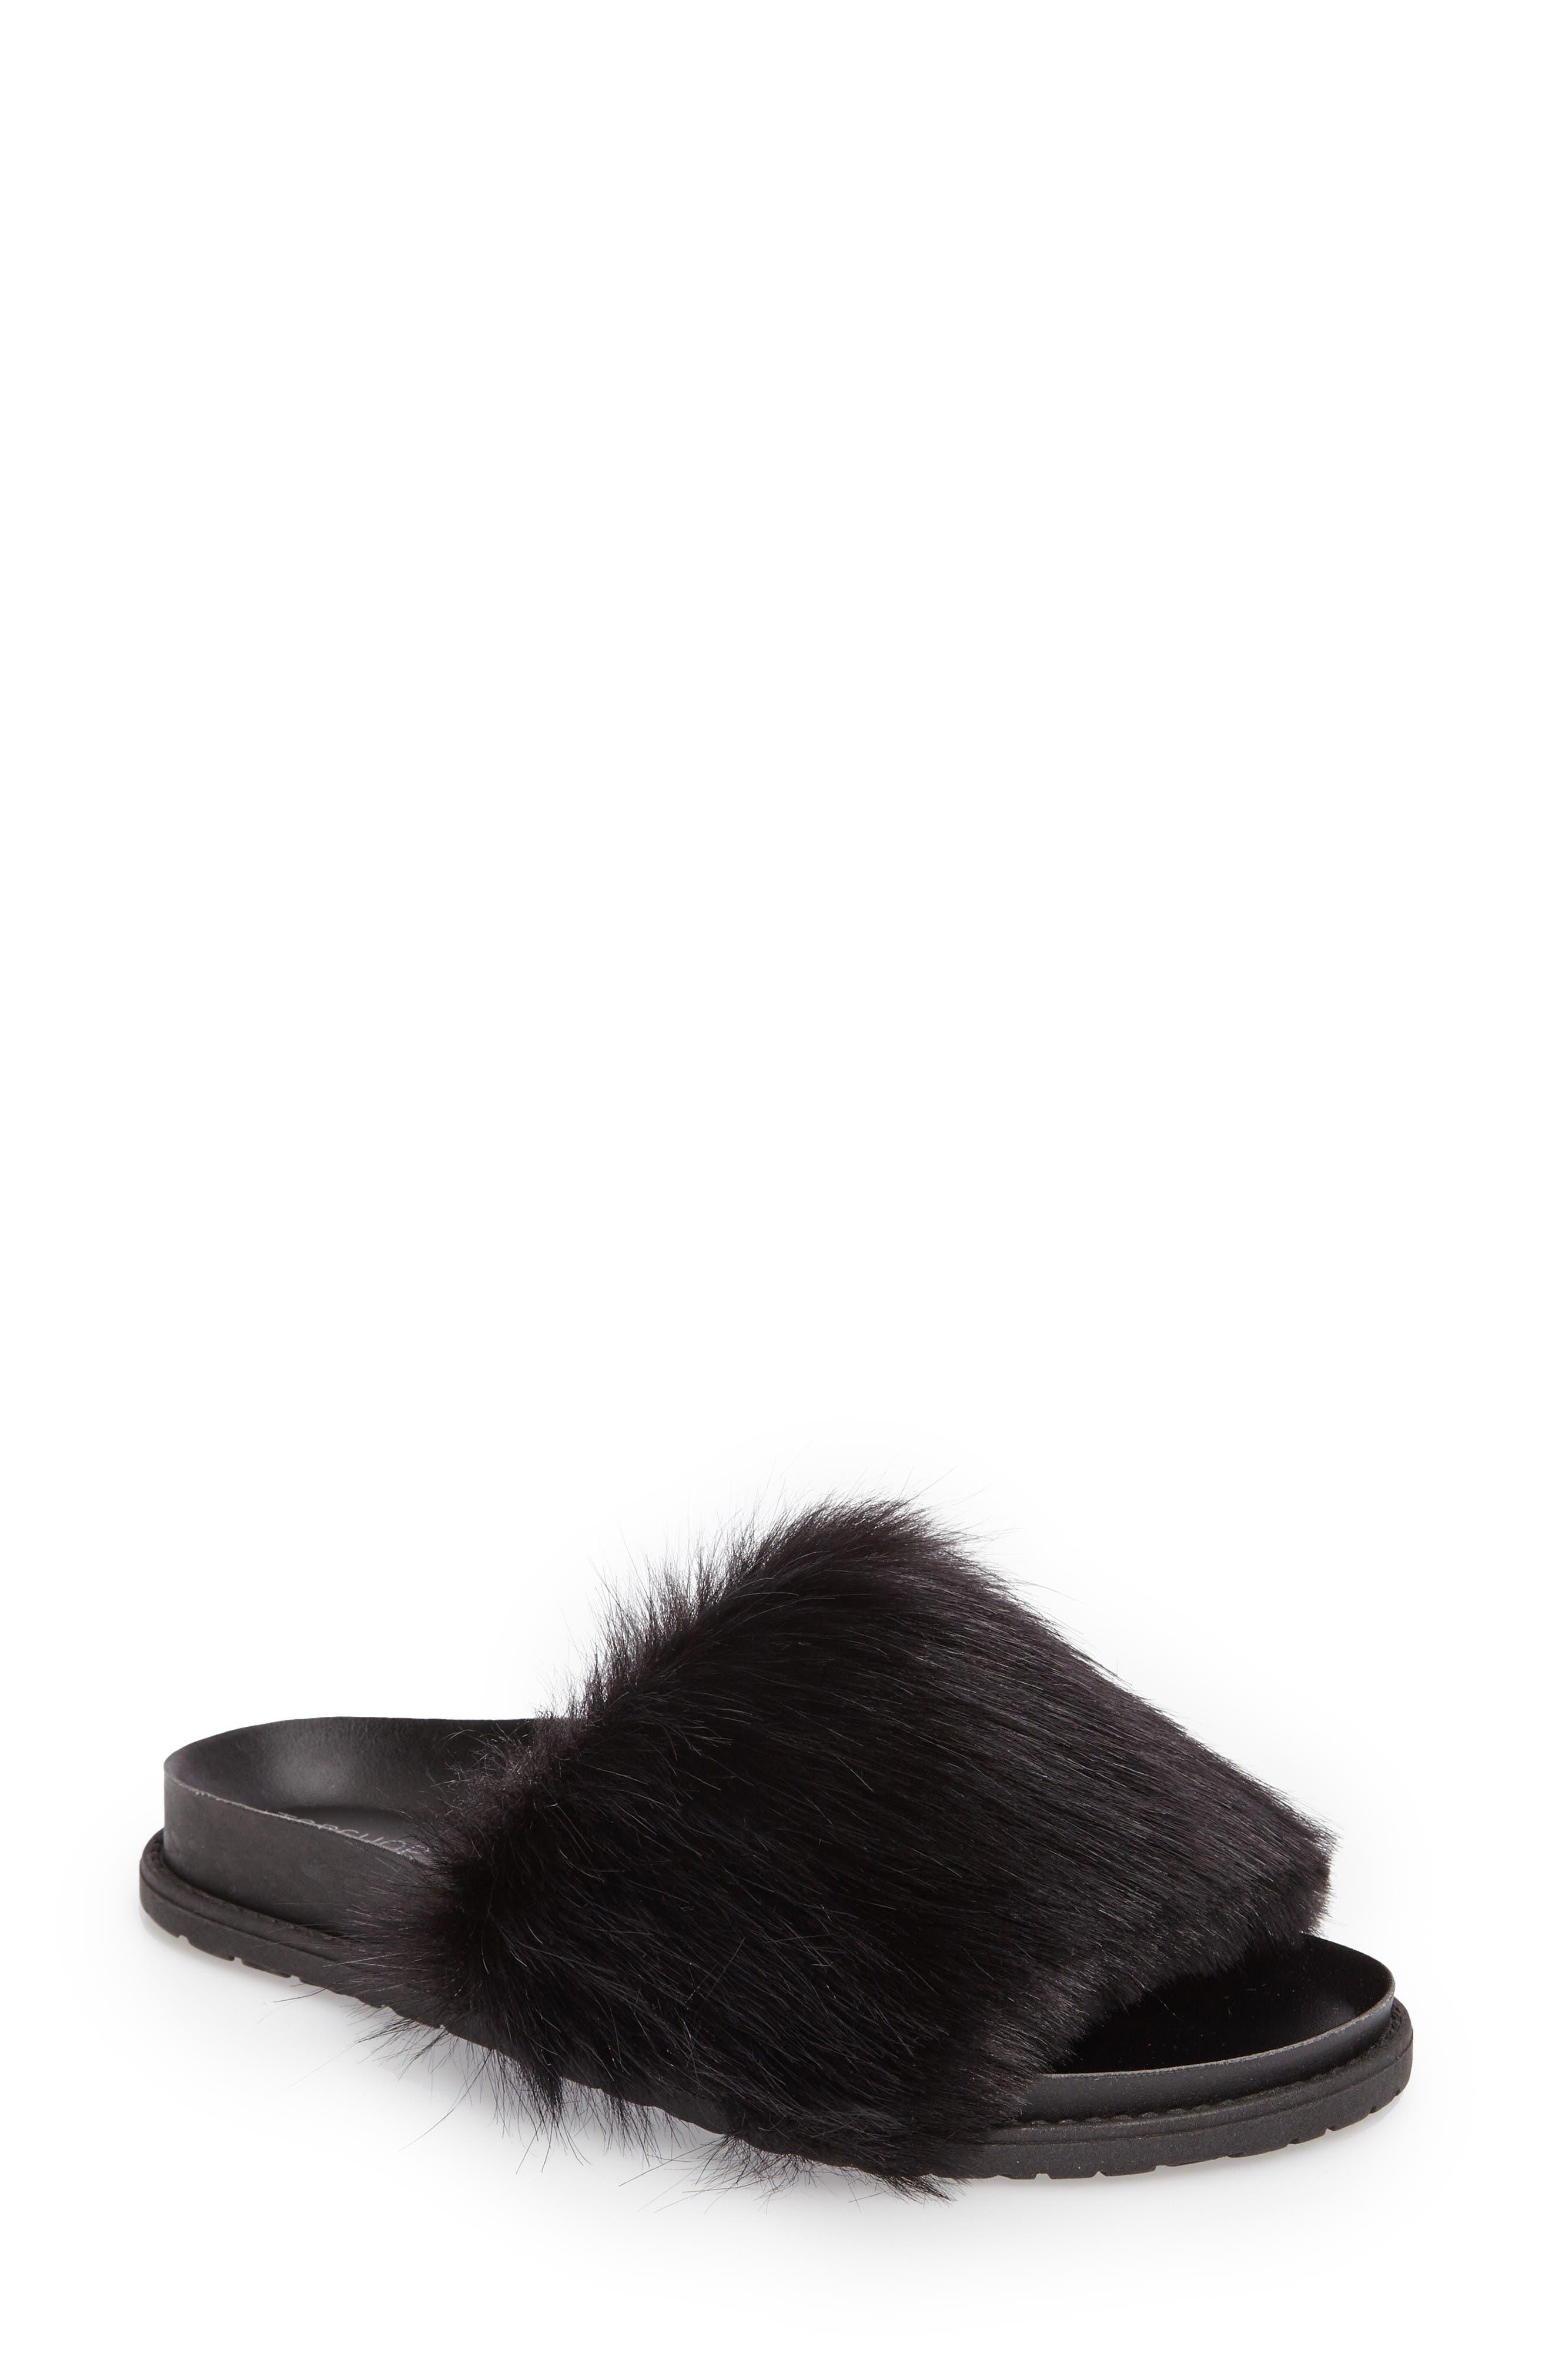 Alternate Image 1 Selected - Topshop Faux Fur Slide Sandal (Women)